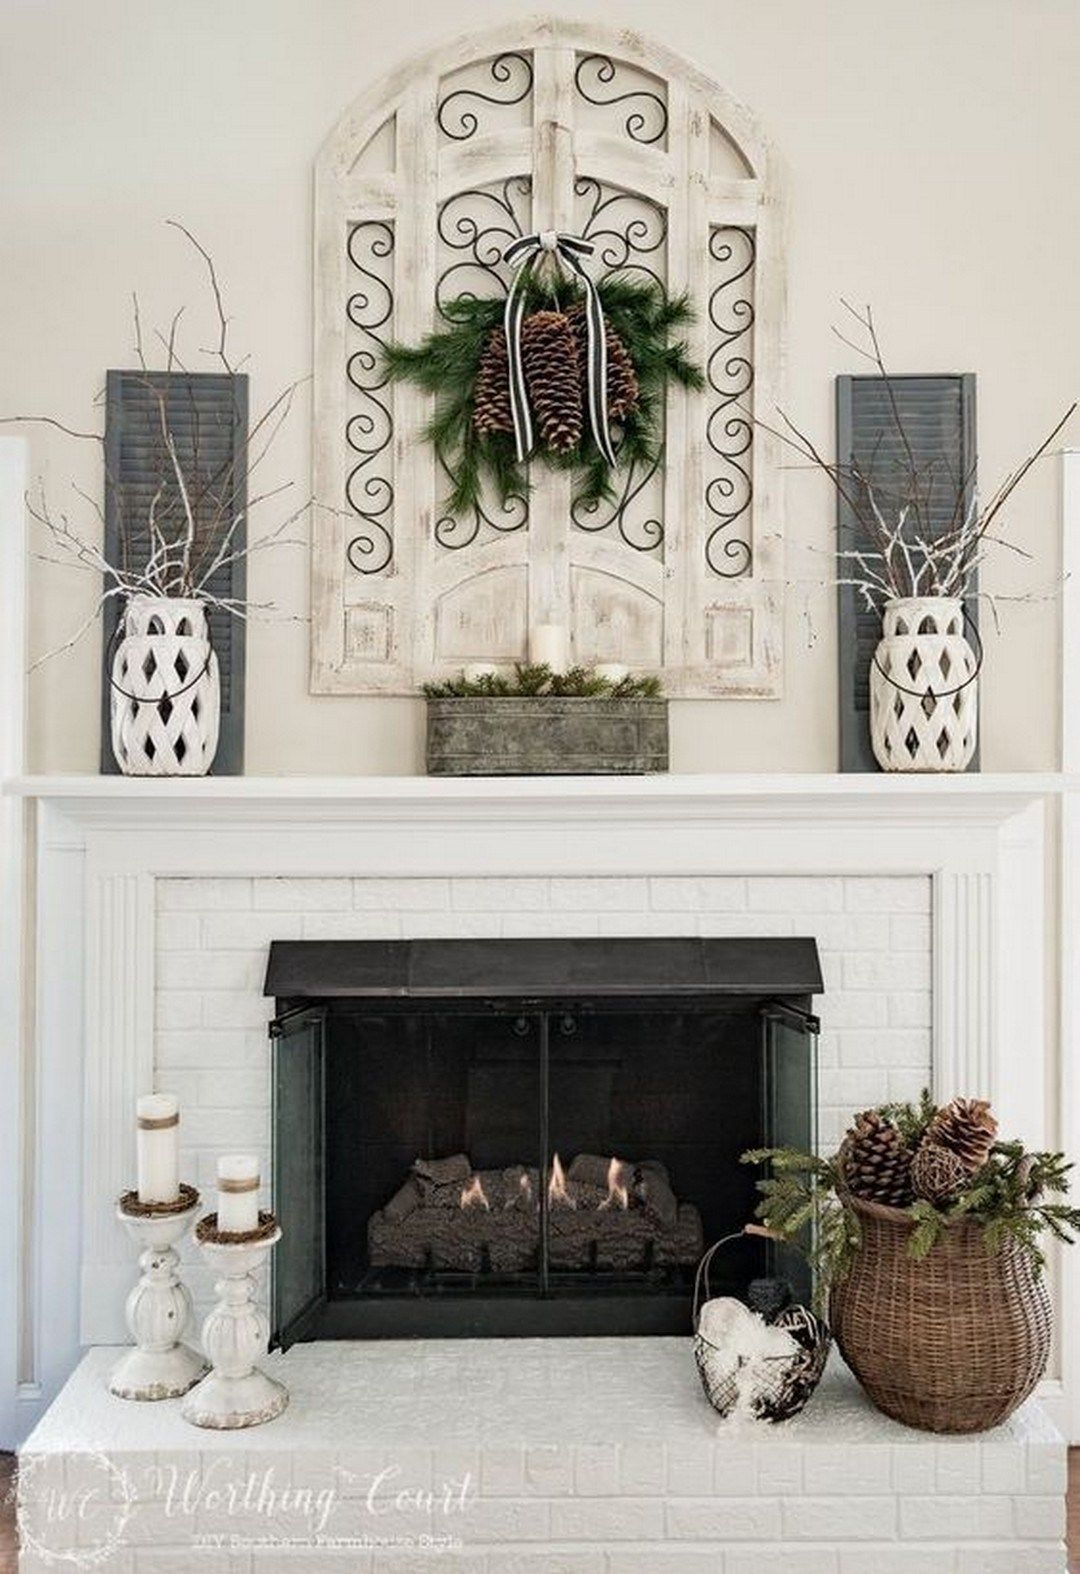 Modern Farmhouse Fireplace Ideas That You Should Copy Hearth Decor Fireplace Mantle Decor Fireplace Hearth Decor